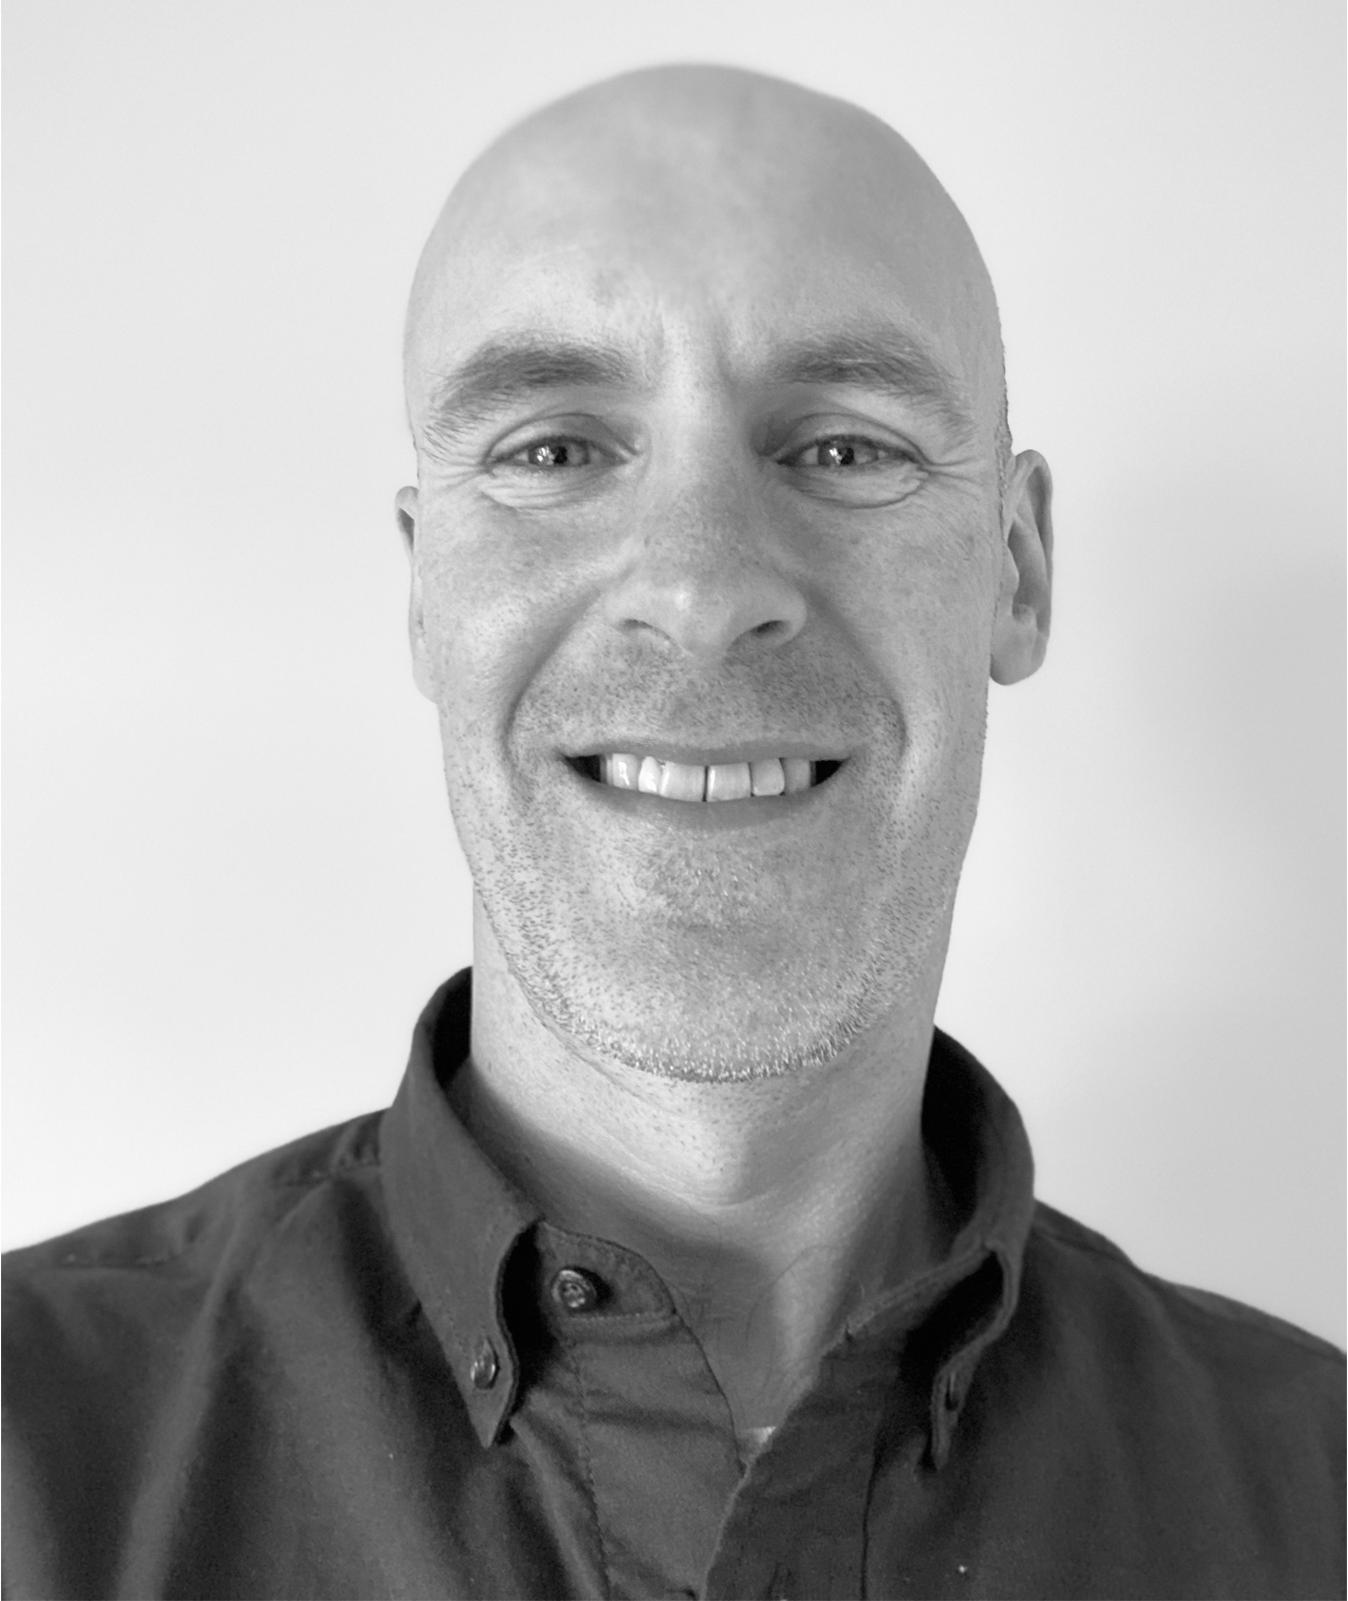 Matt Peake, Global Director of Public Policy